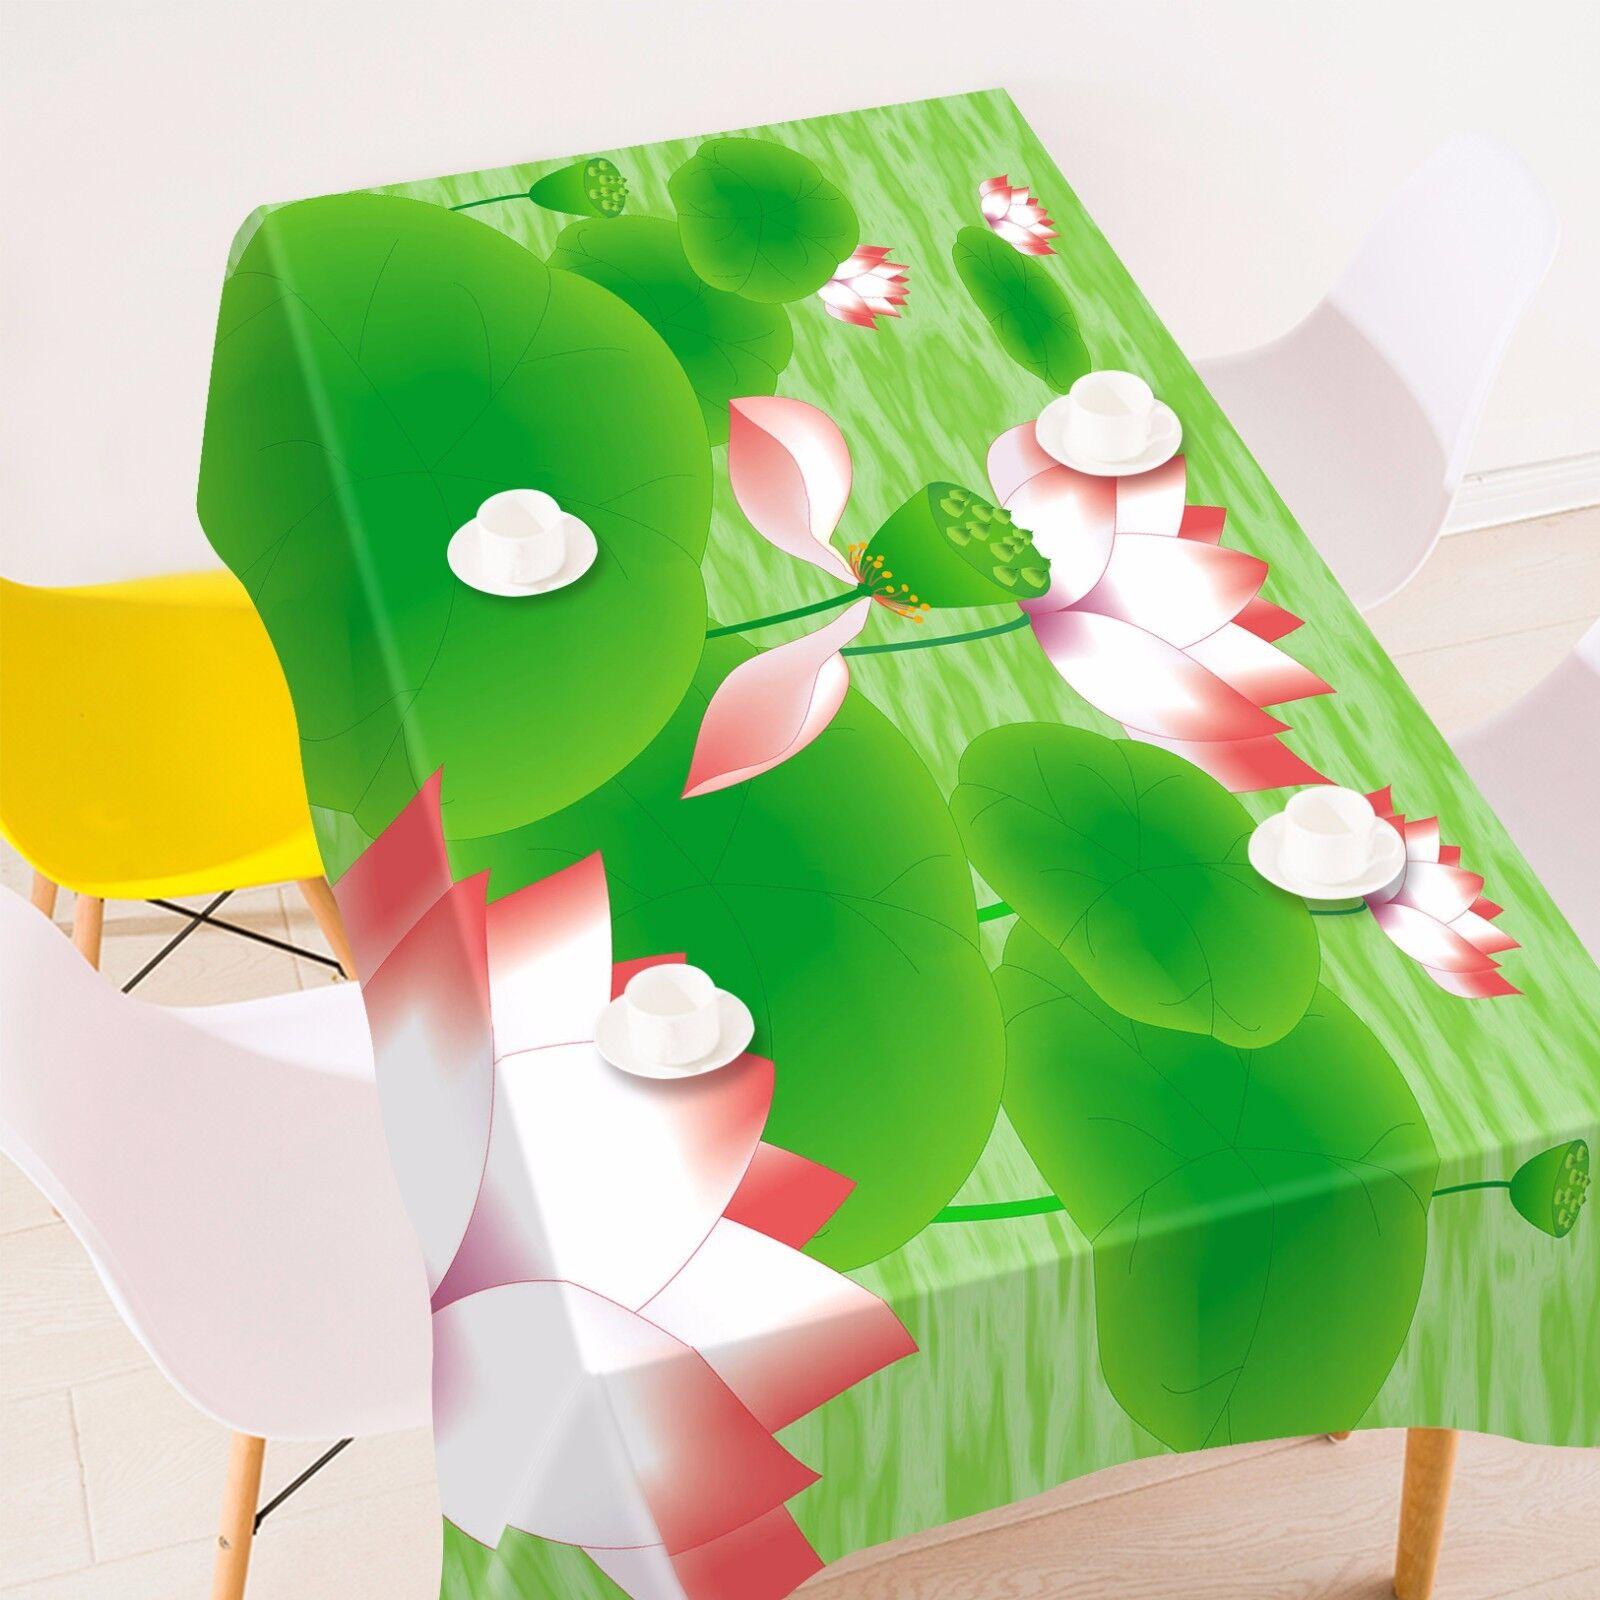 3D Lotu Seed Tablecloth Table Cover Cloth Birthday Party AJ WALLPAPER UK Lemon